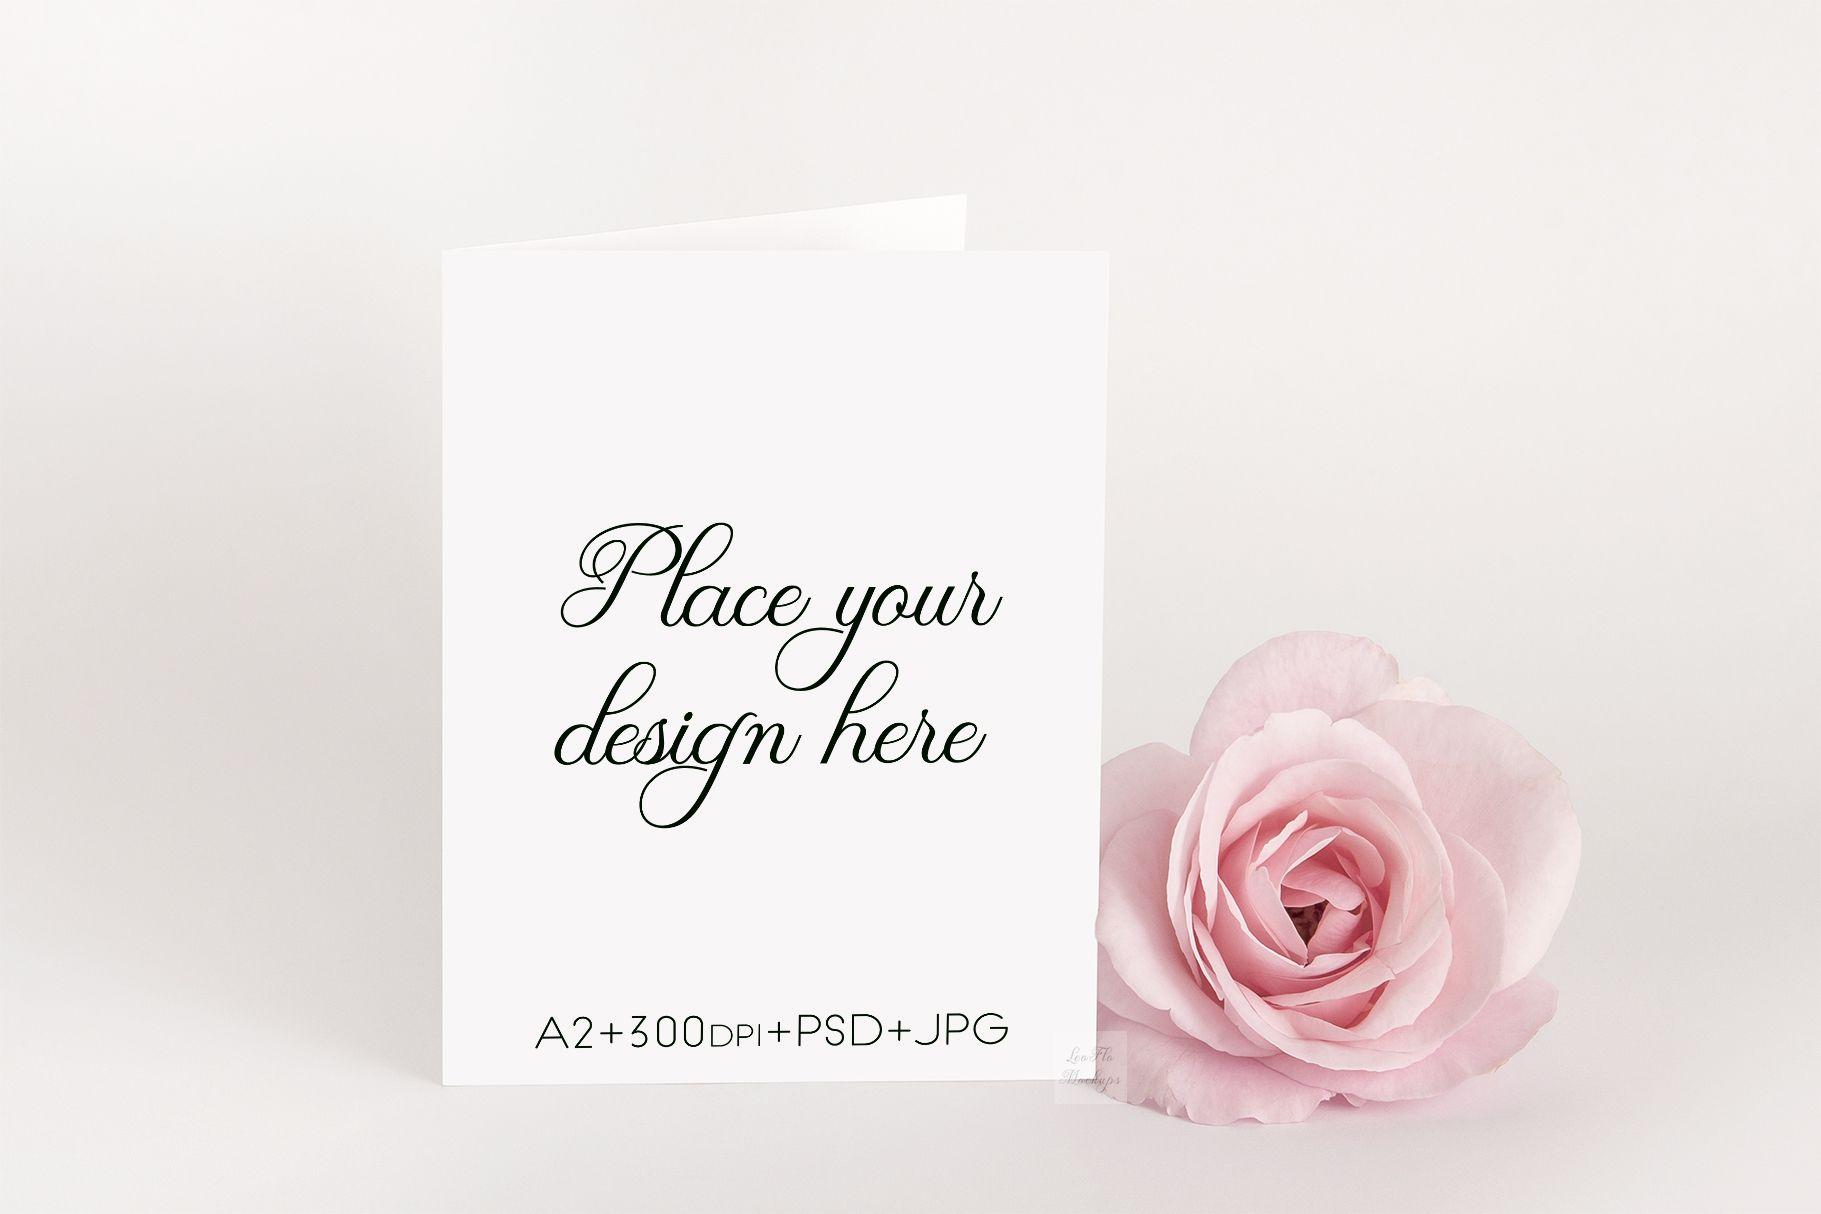 A2 Greeting Card Invitation Psd Mockup Graphic By Leo Flo Mockups Creative Fabrica Stationery Mockup Invitations Mockup Psd